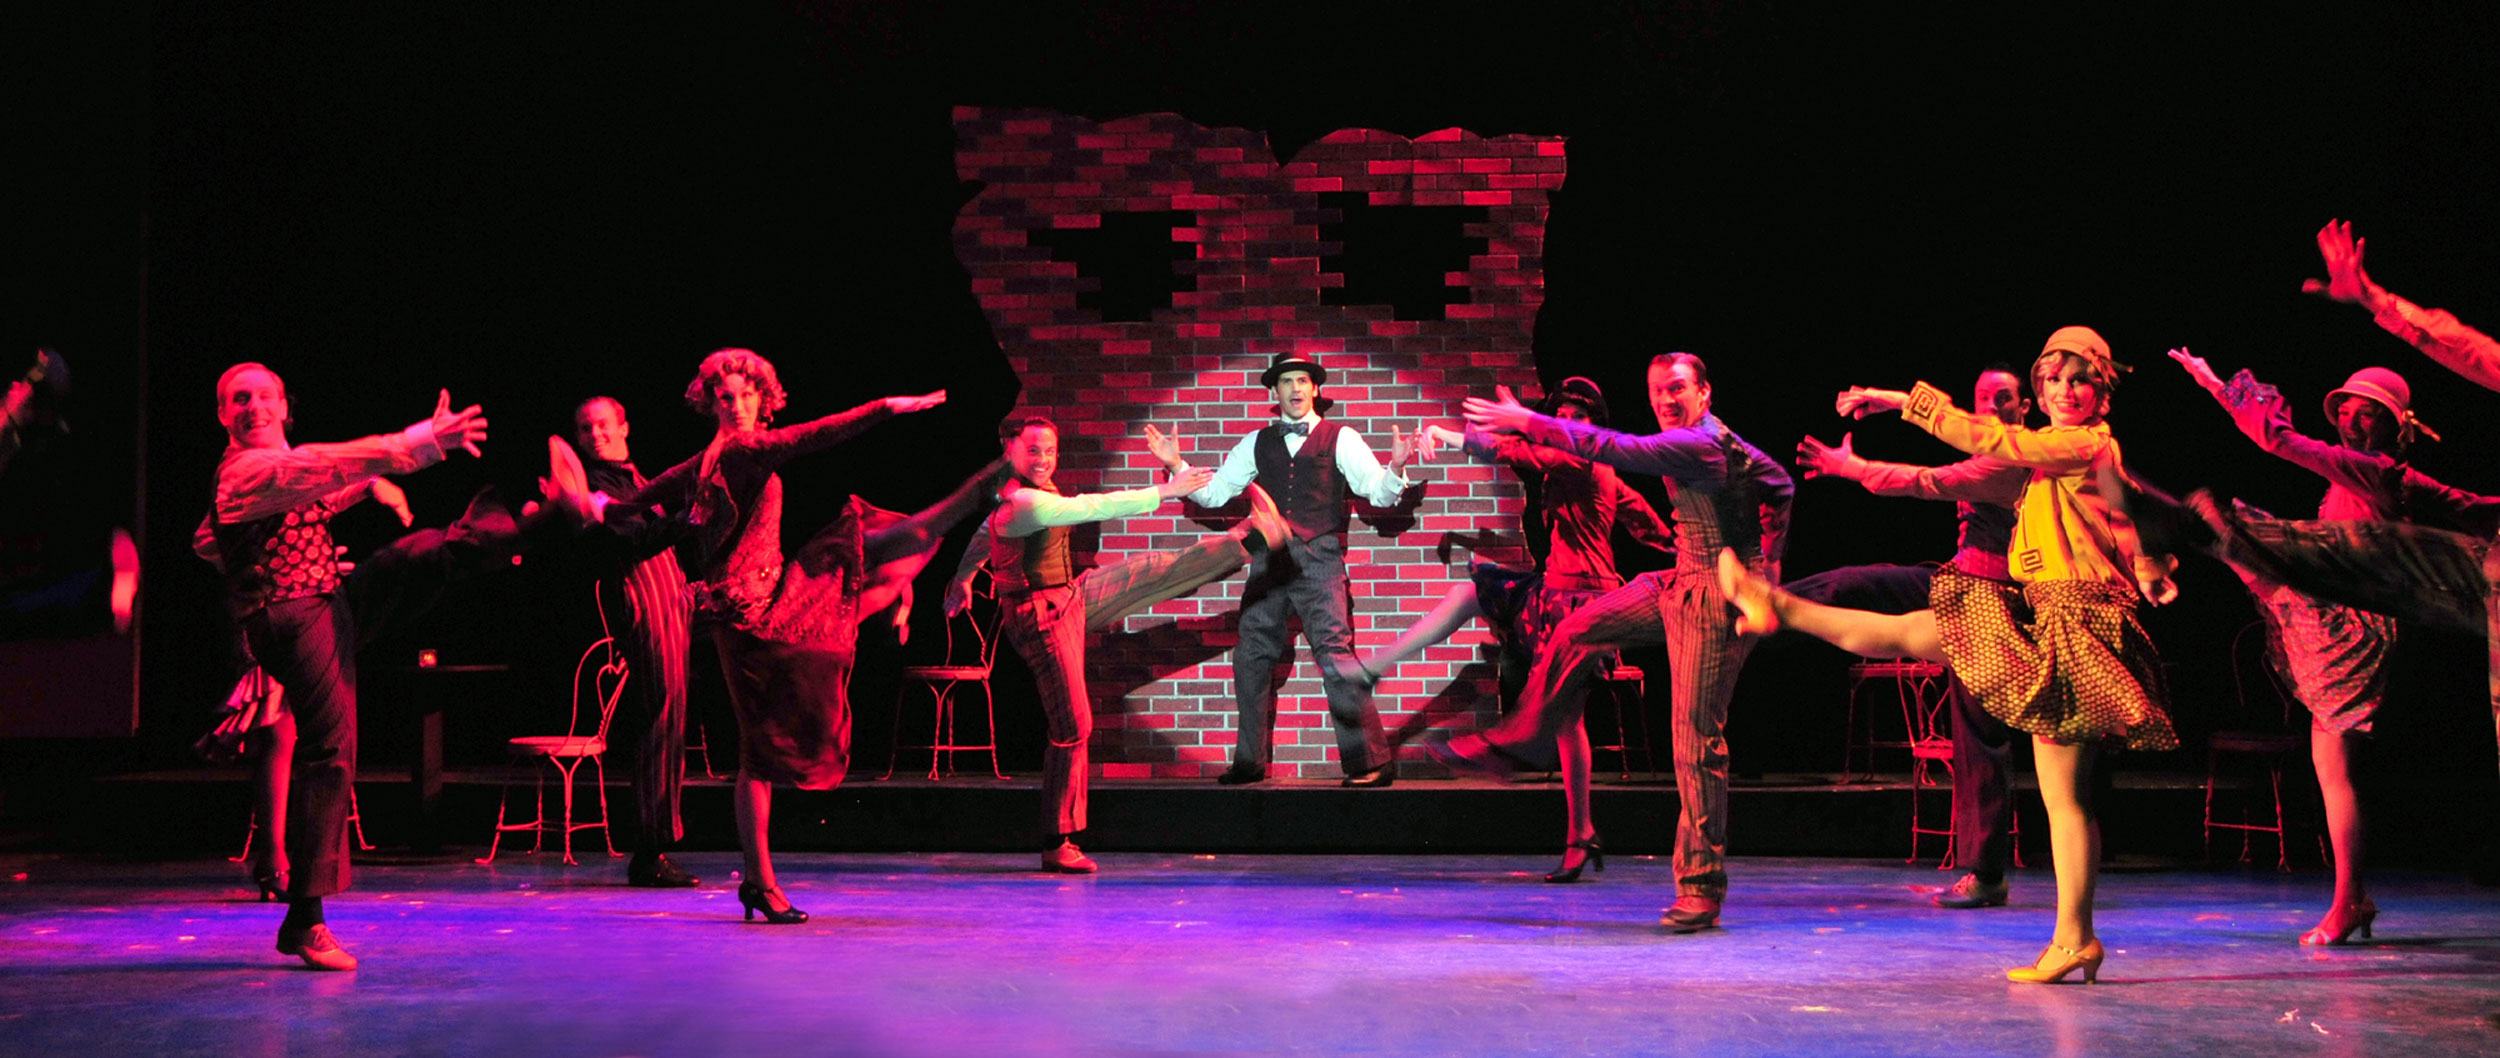 2009_SITR_Joey-Sorge_Cast_Broadway-Rhythm_photo-by-Gary-Ng.jpg